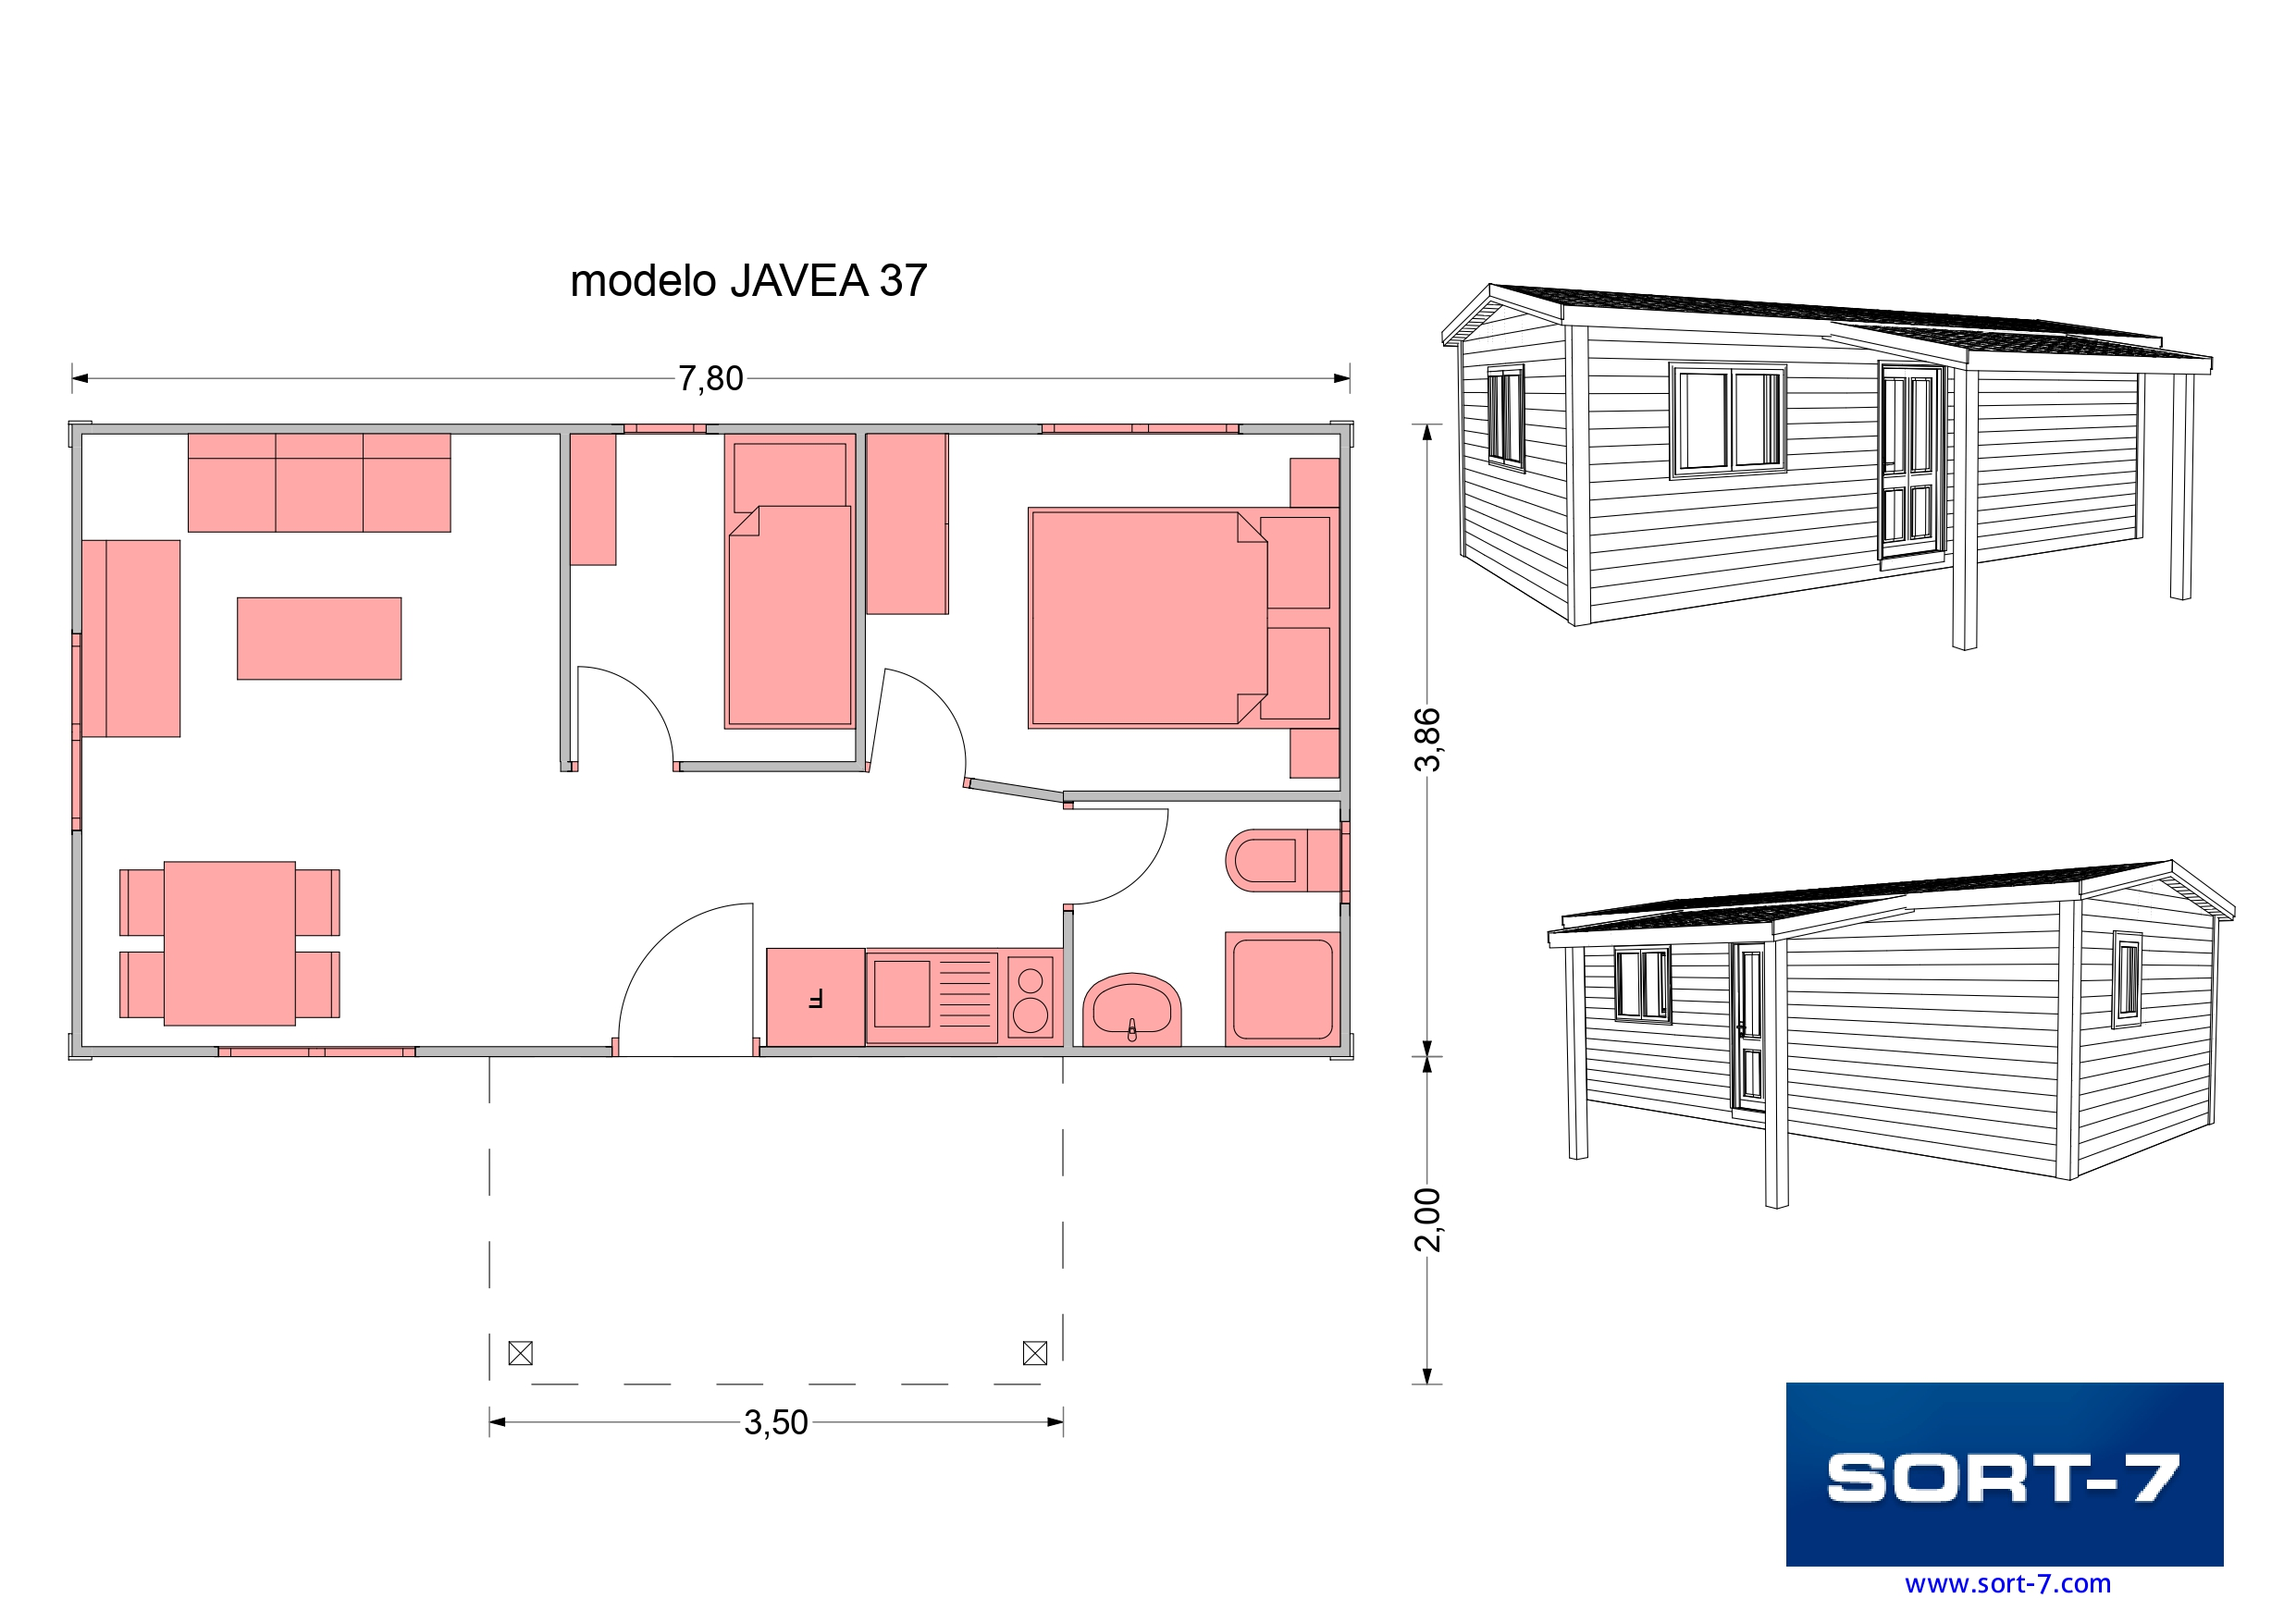 Solicitar presupuesto: Modelo 37m² Javea - 8b86d-37-JAVEA-vista6_page-0001.jpg